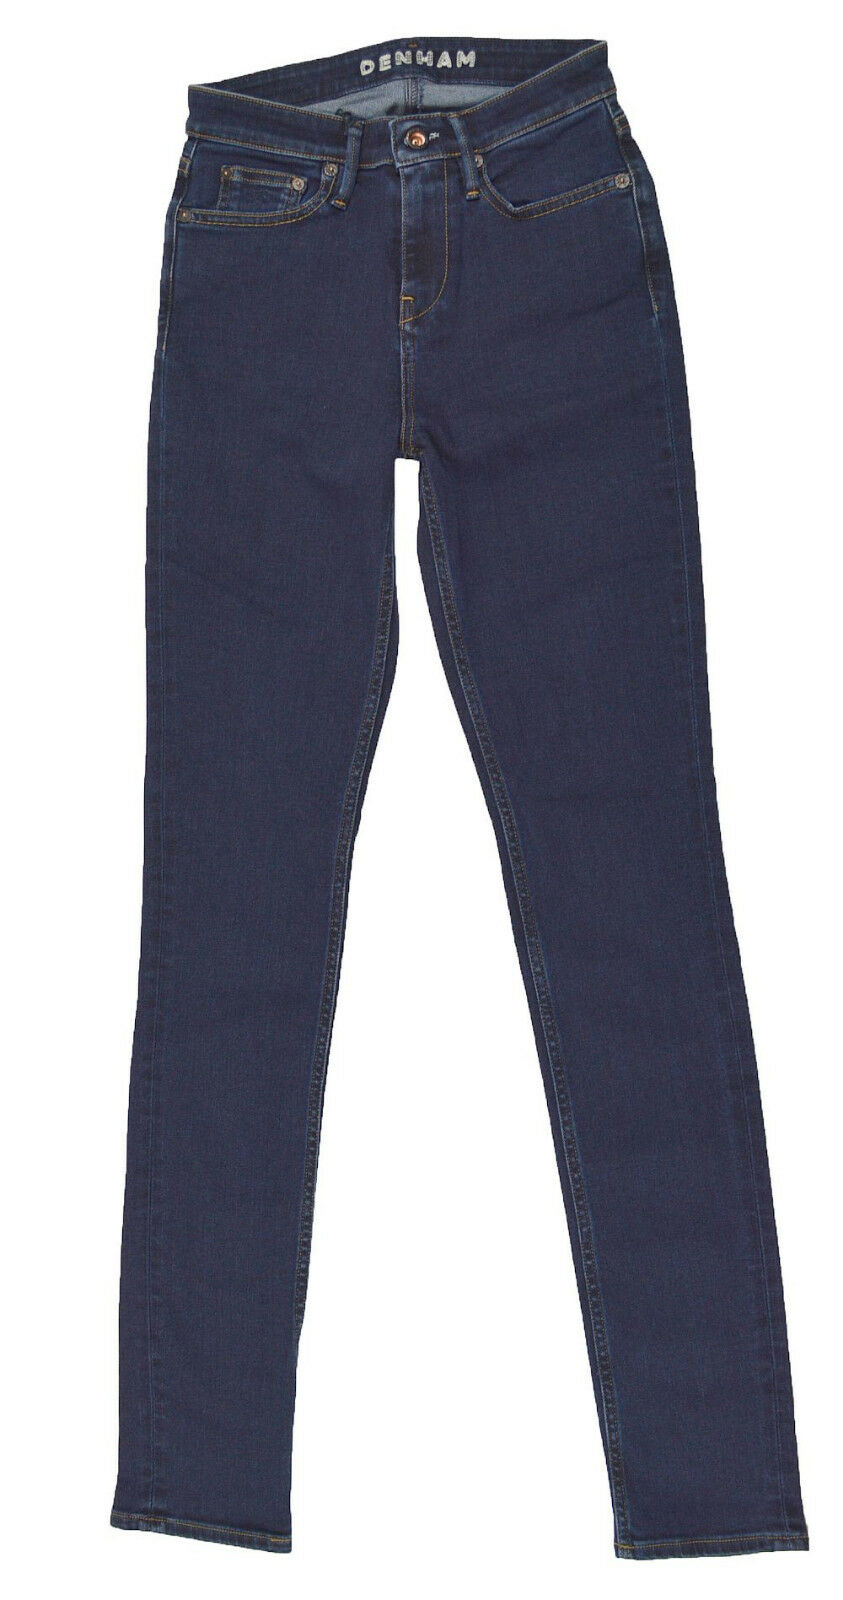 Denham Marianne OWI High Skinny Fit W25L32 Damen Jeans Hose jeans hosen 16-202